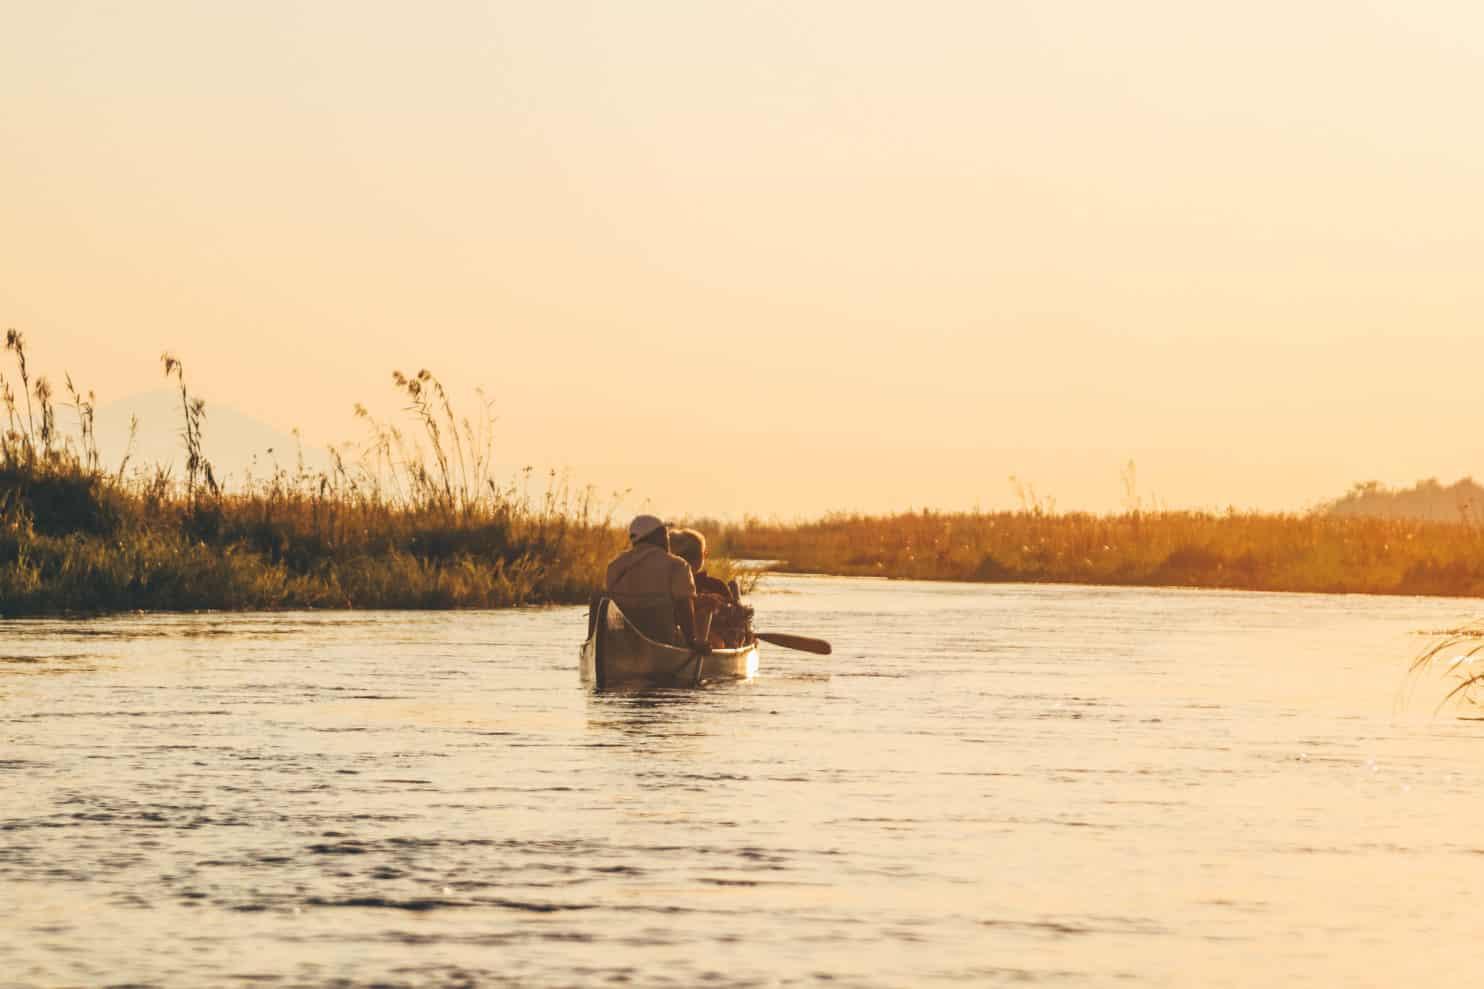 A canoe Safari in Africa